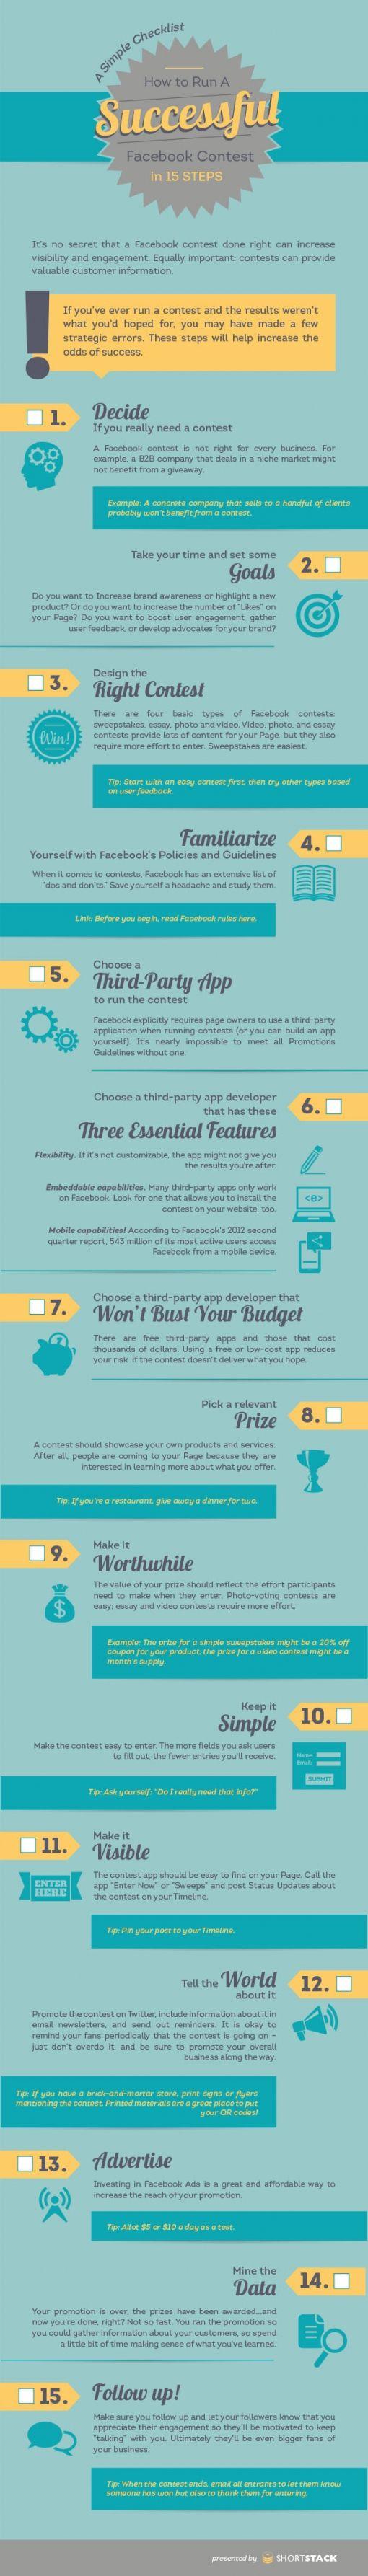 facebook-contest-infographic